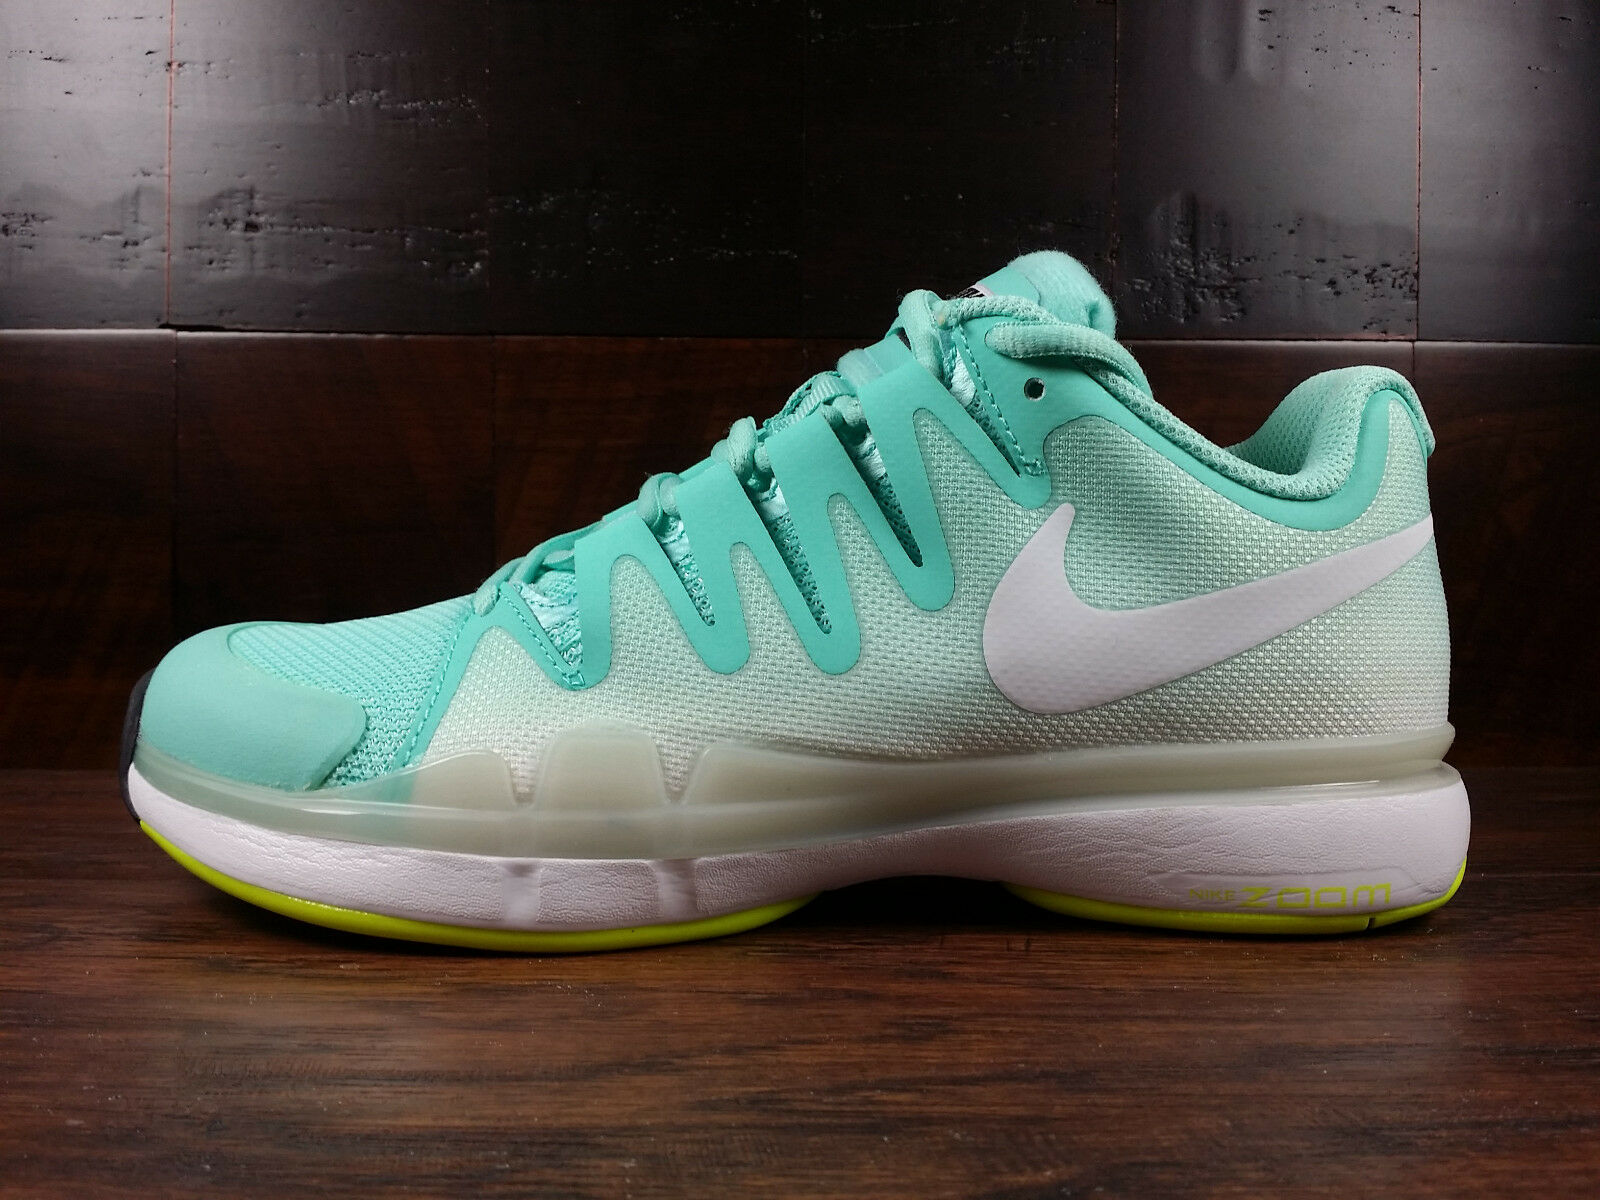 Nike Zoom Vapor 9.5 Tour Sharapova (Bleached Turq) Tennis [631475-317] Womens